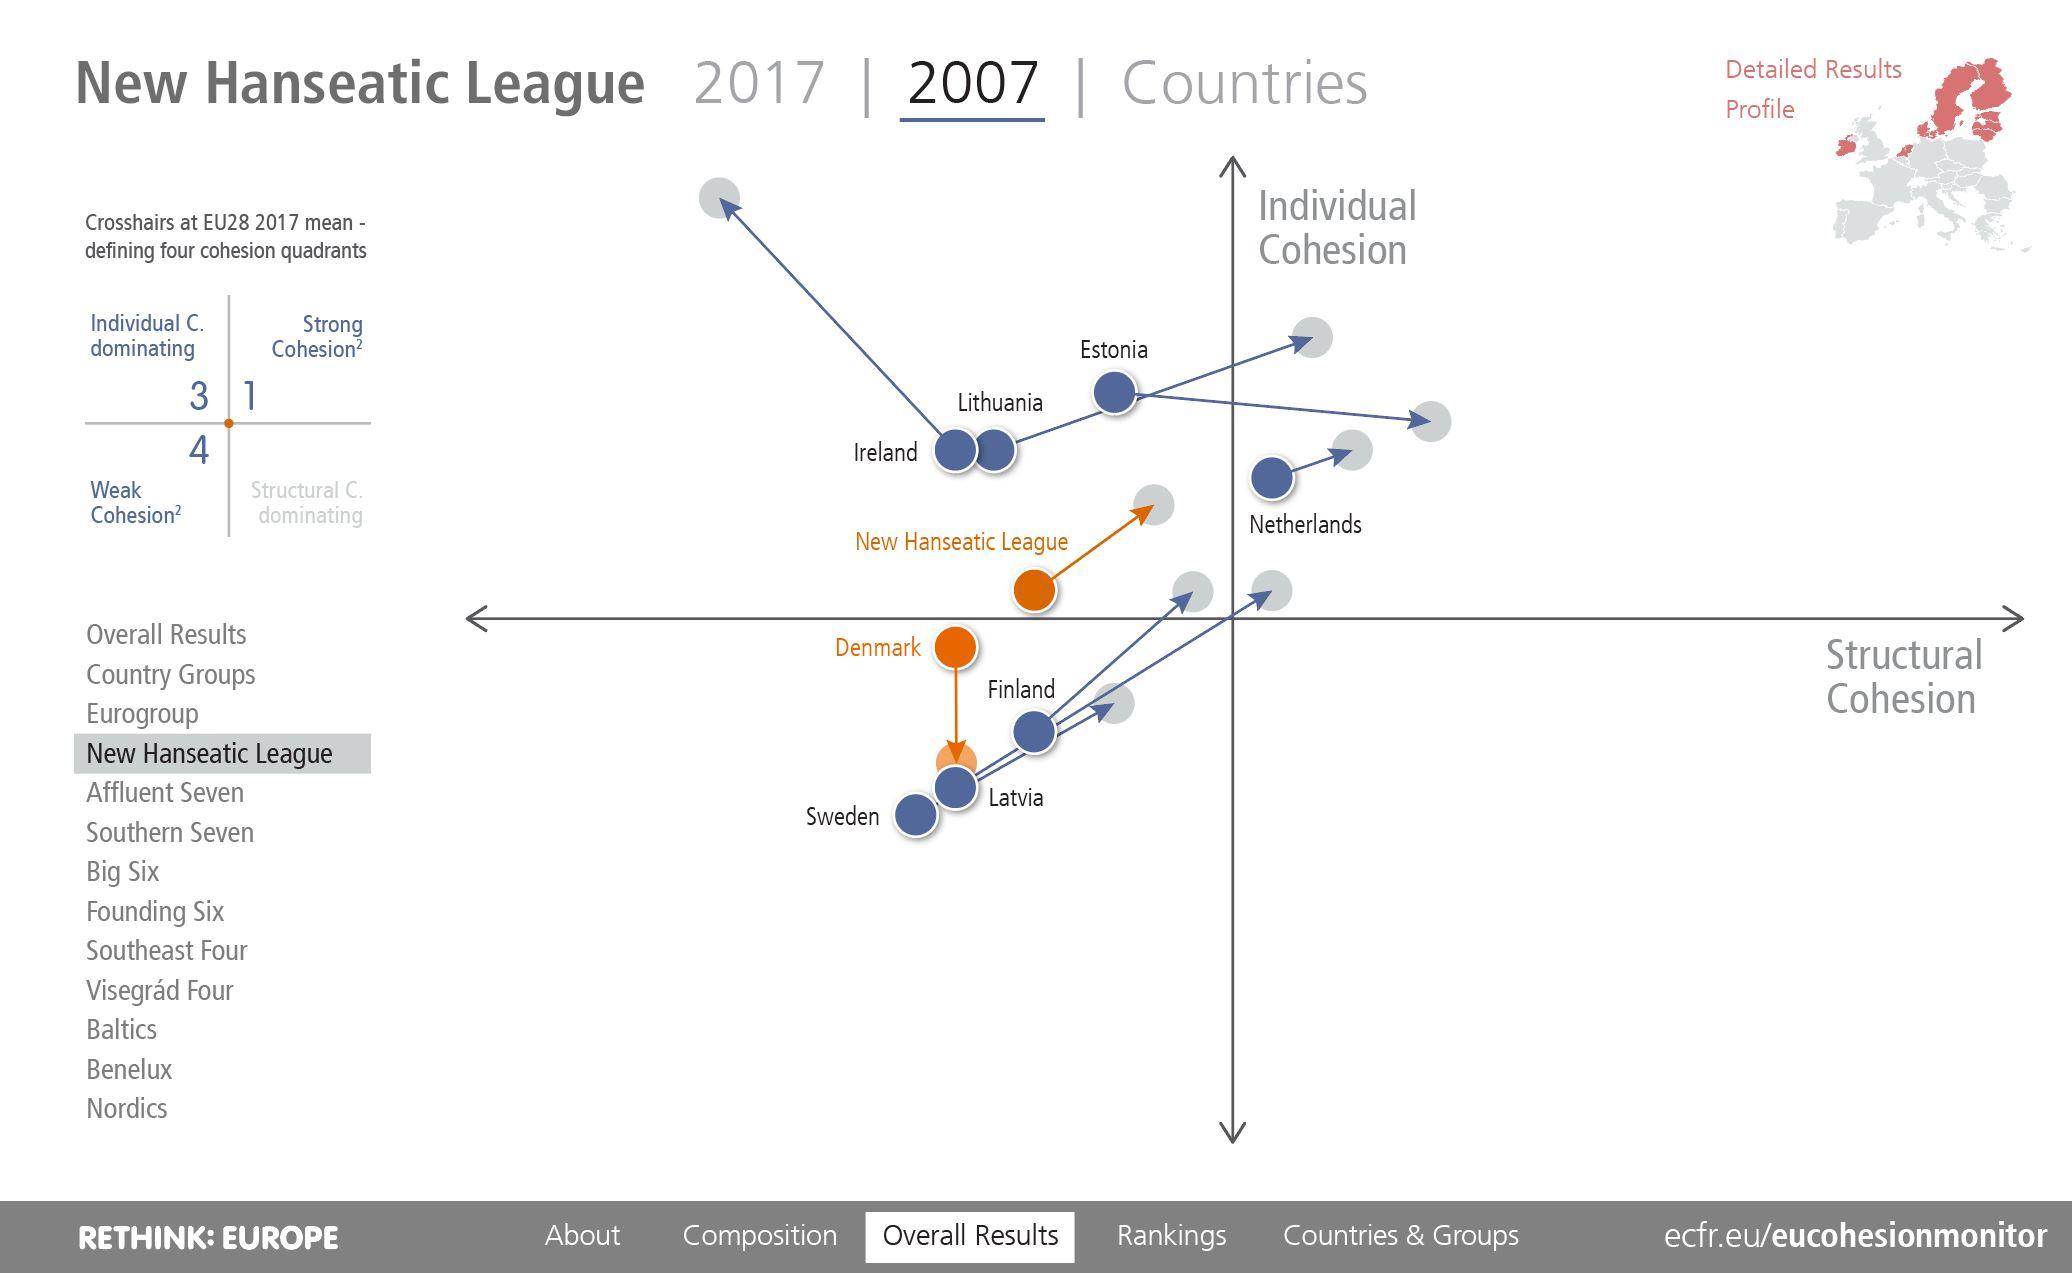 EU Coheison Monitor 2019: Denmark in the New Hanseatic League